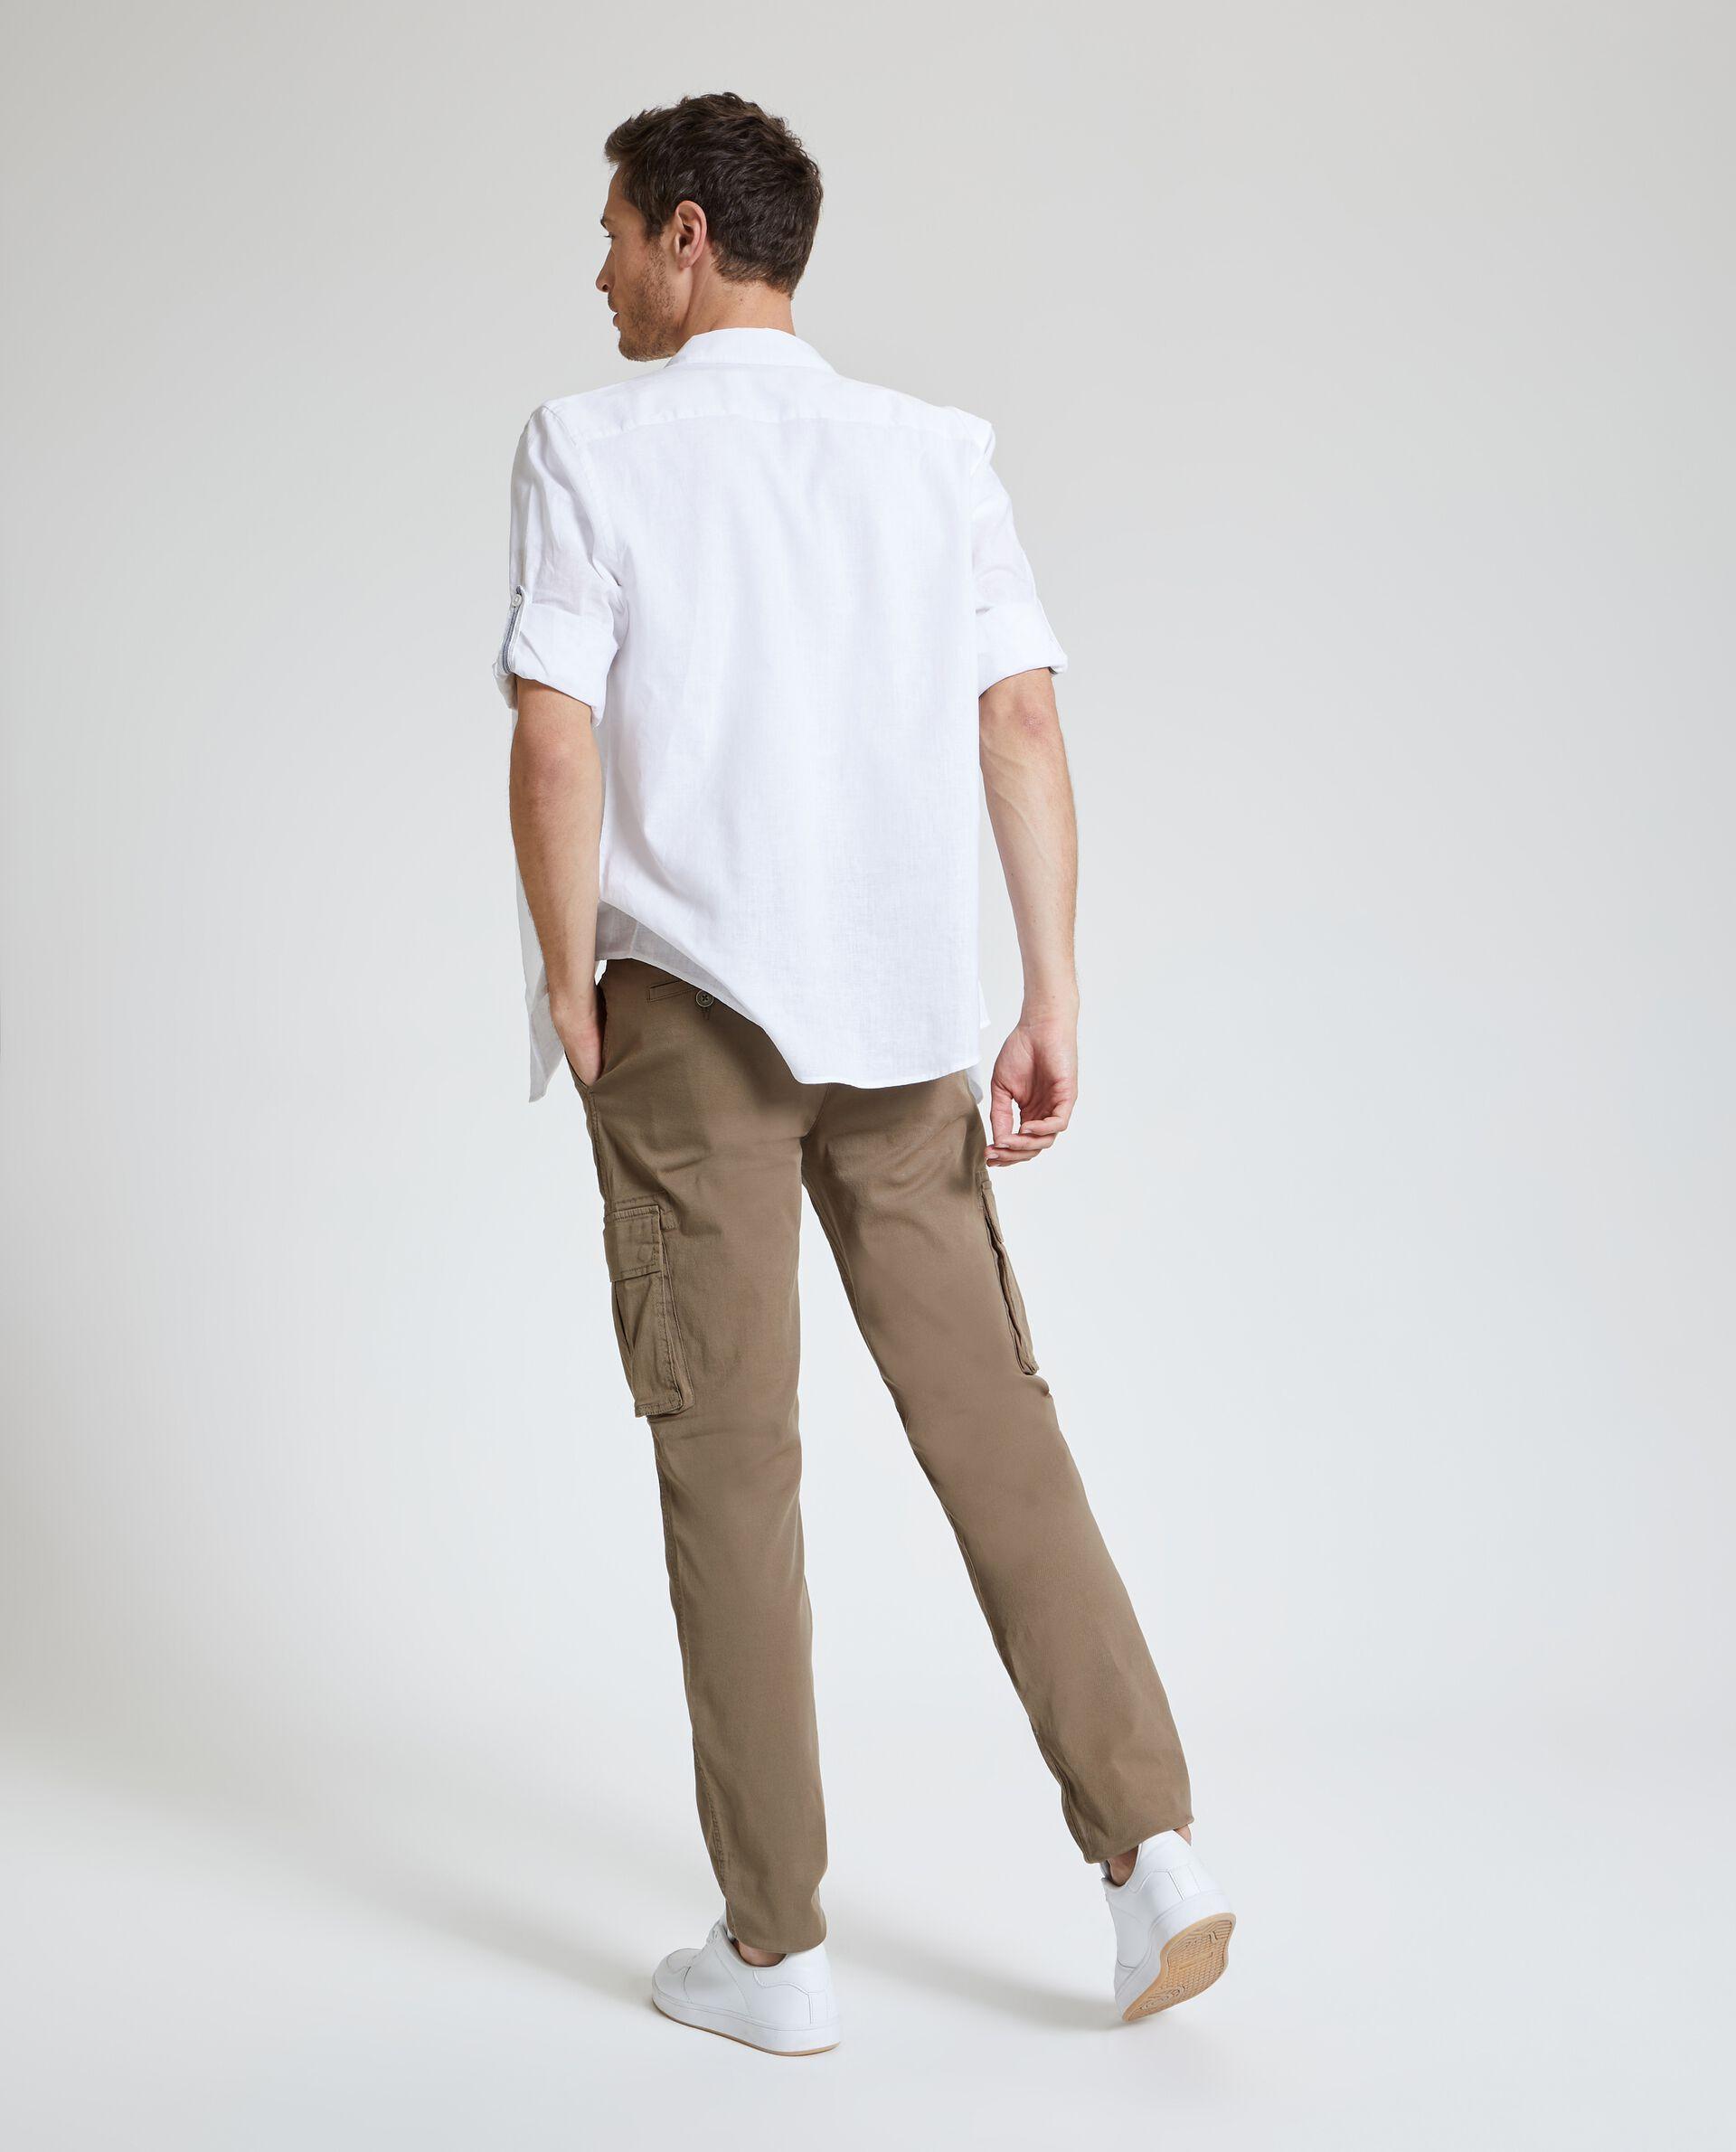 Pantaloni cargo in tinta unita uomo